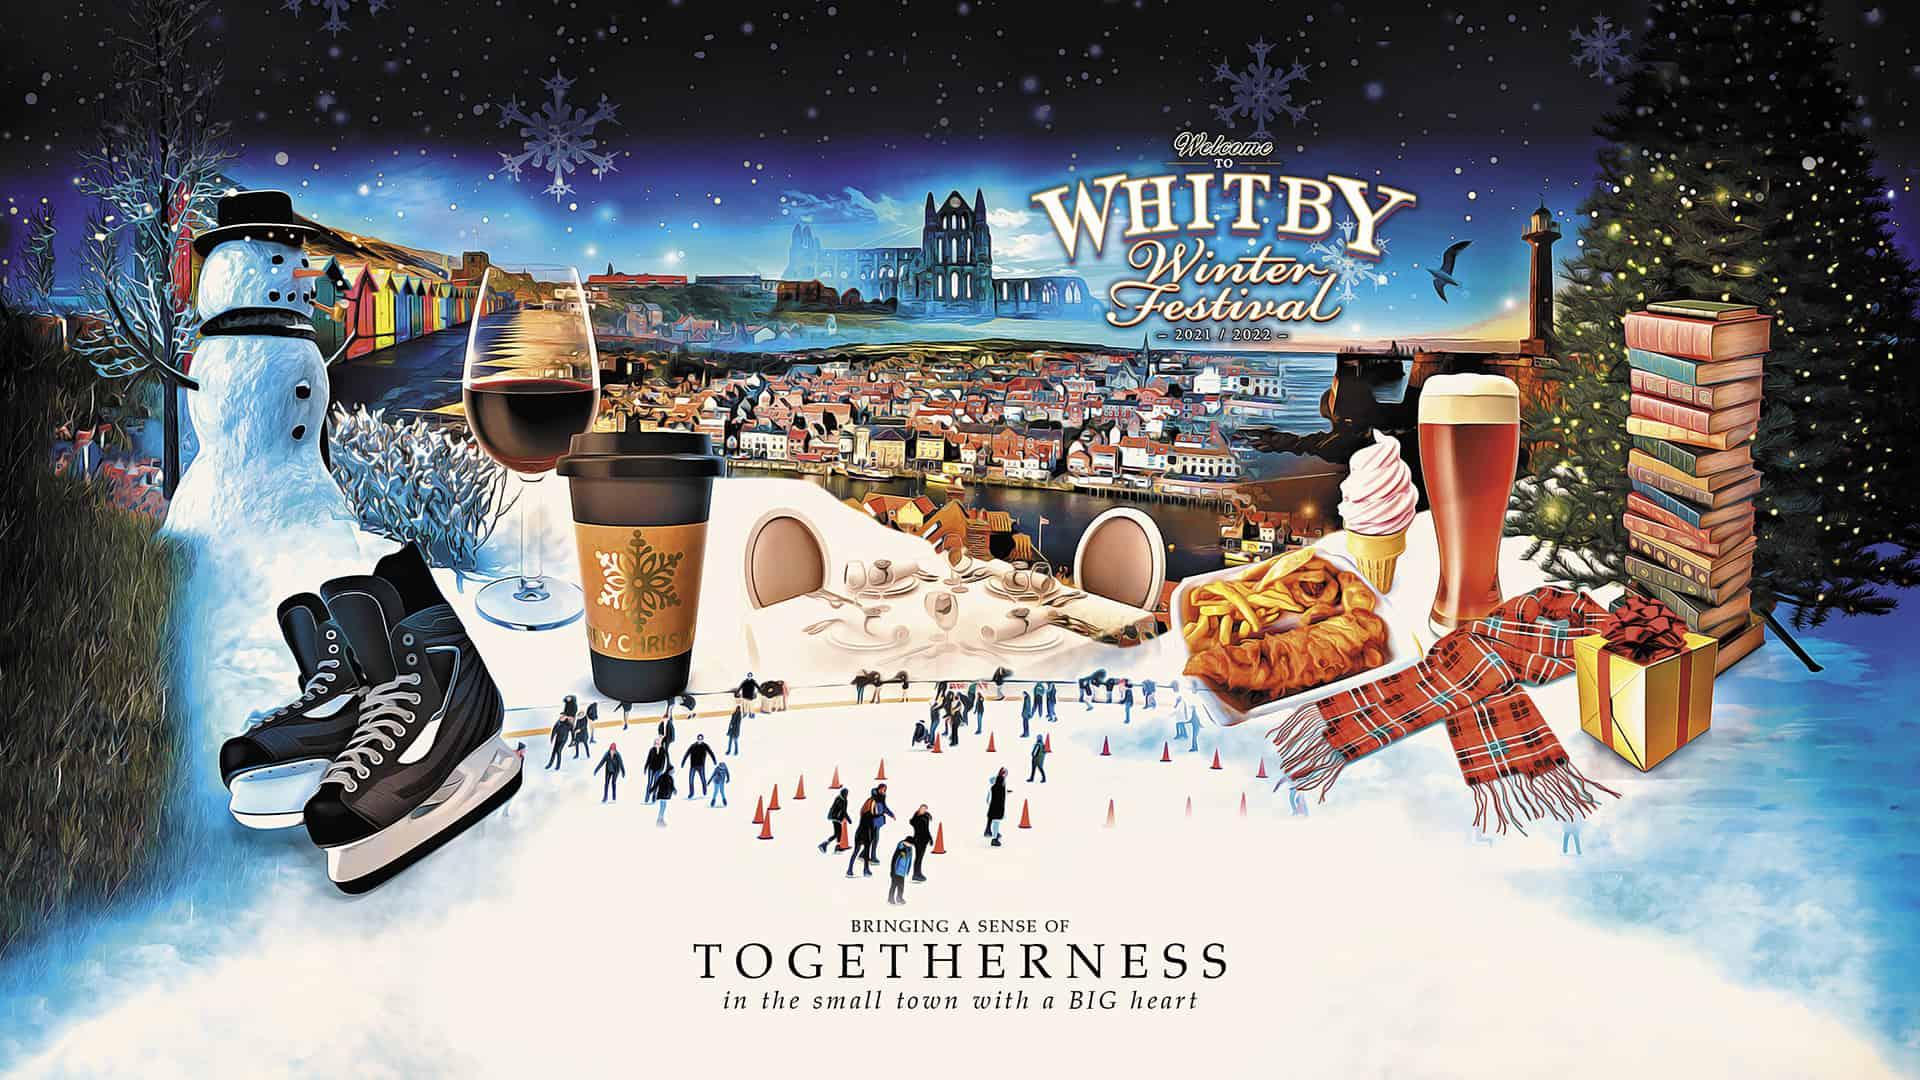 Whitby Image 9